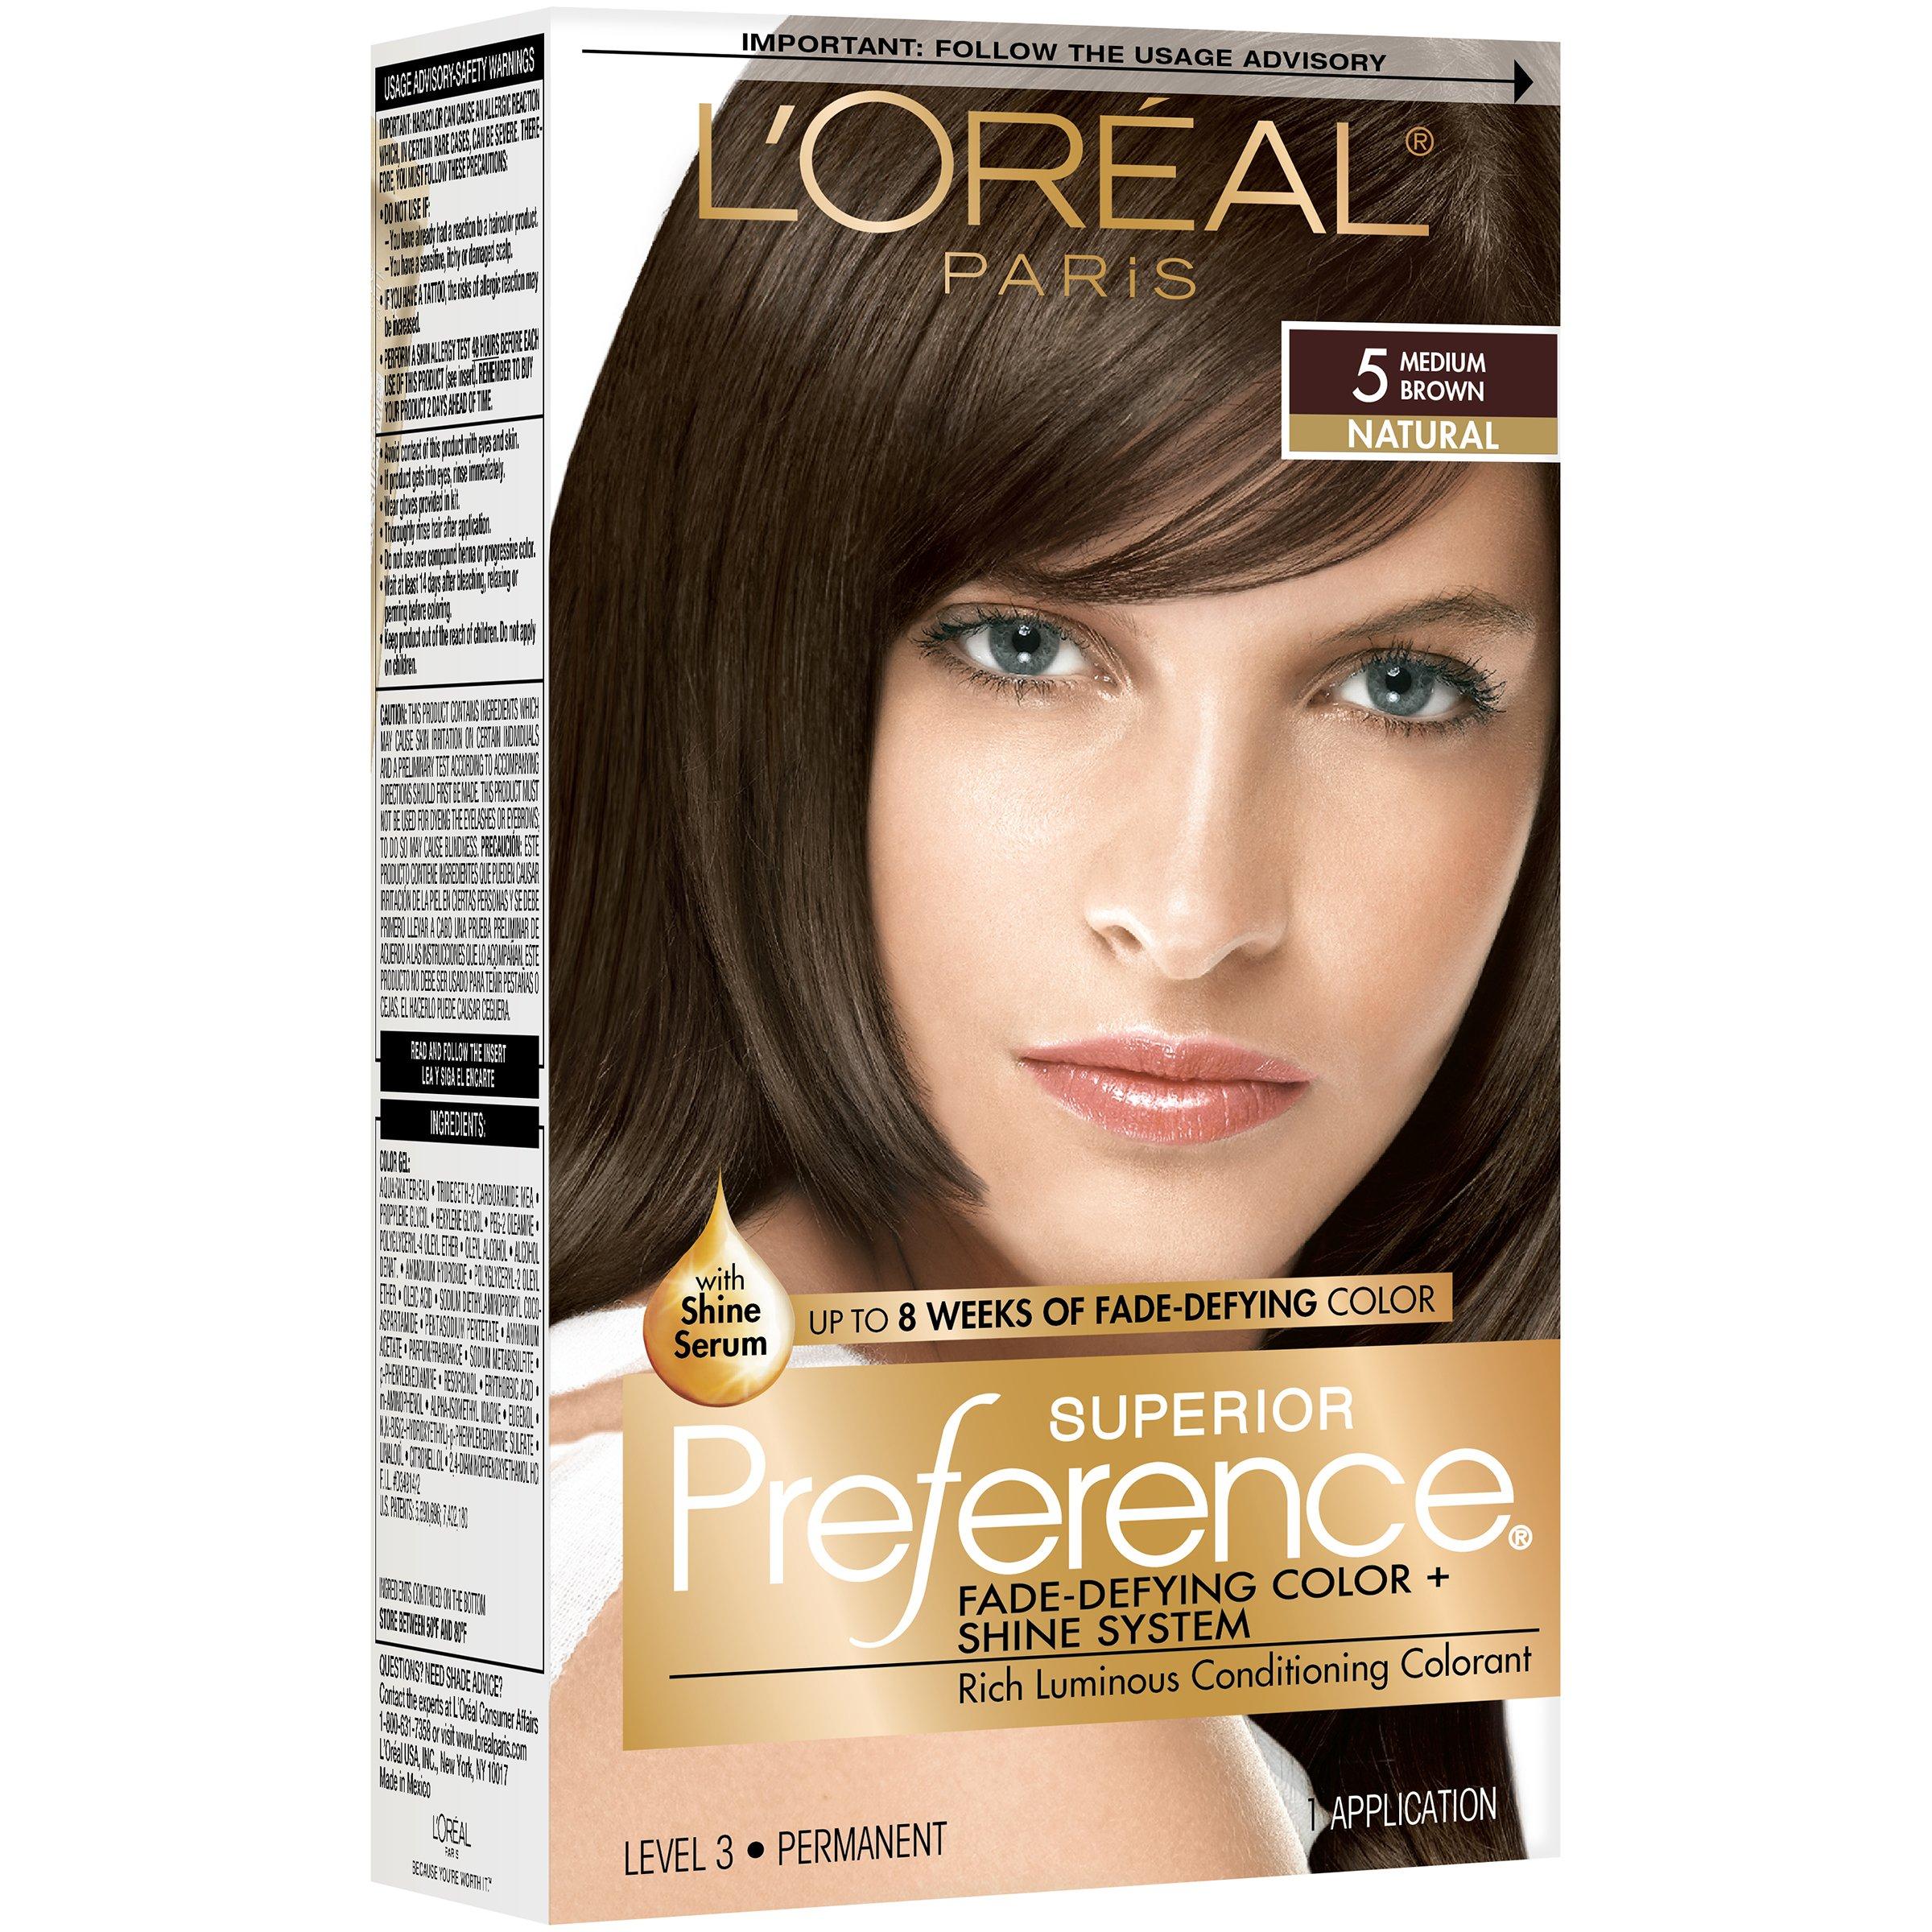 L Oreal Paris Superior Preference Permanent Hair Color 5 Medium Brown Shop Hair Color At H E B